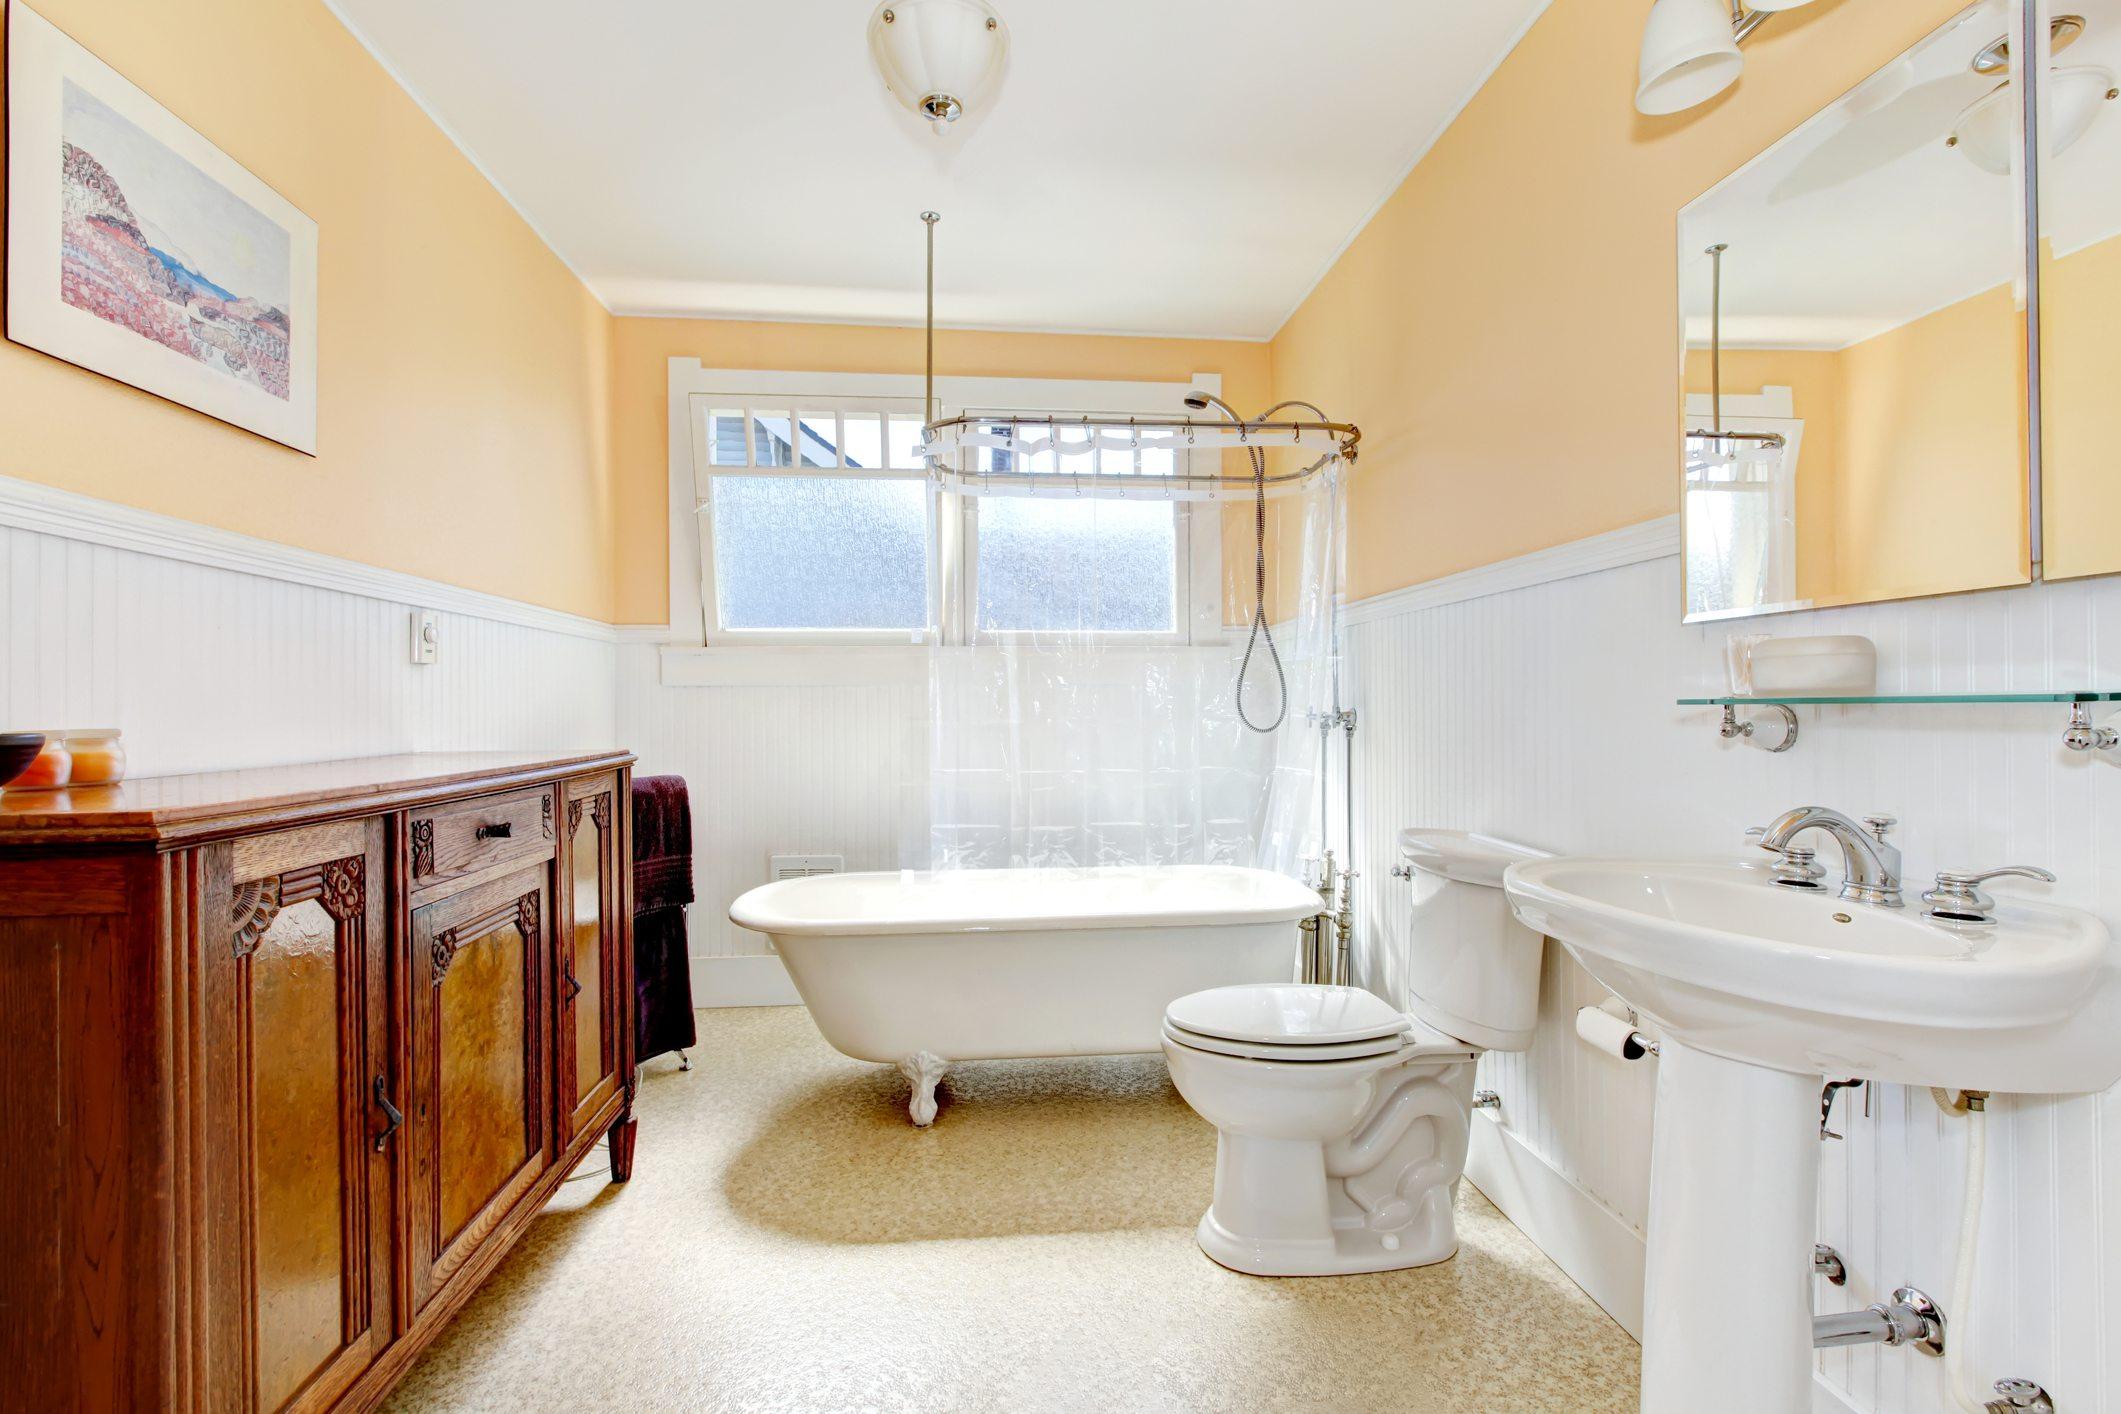 Yellow bathroom with claw foot tub